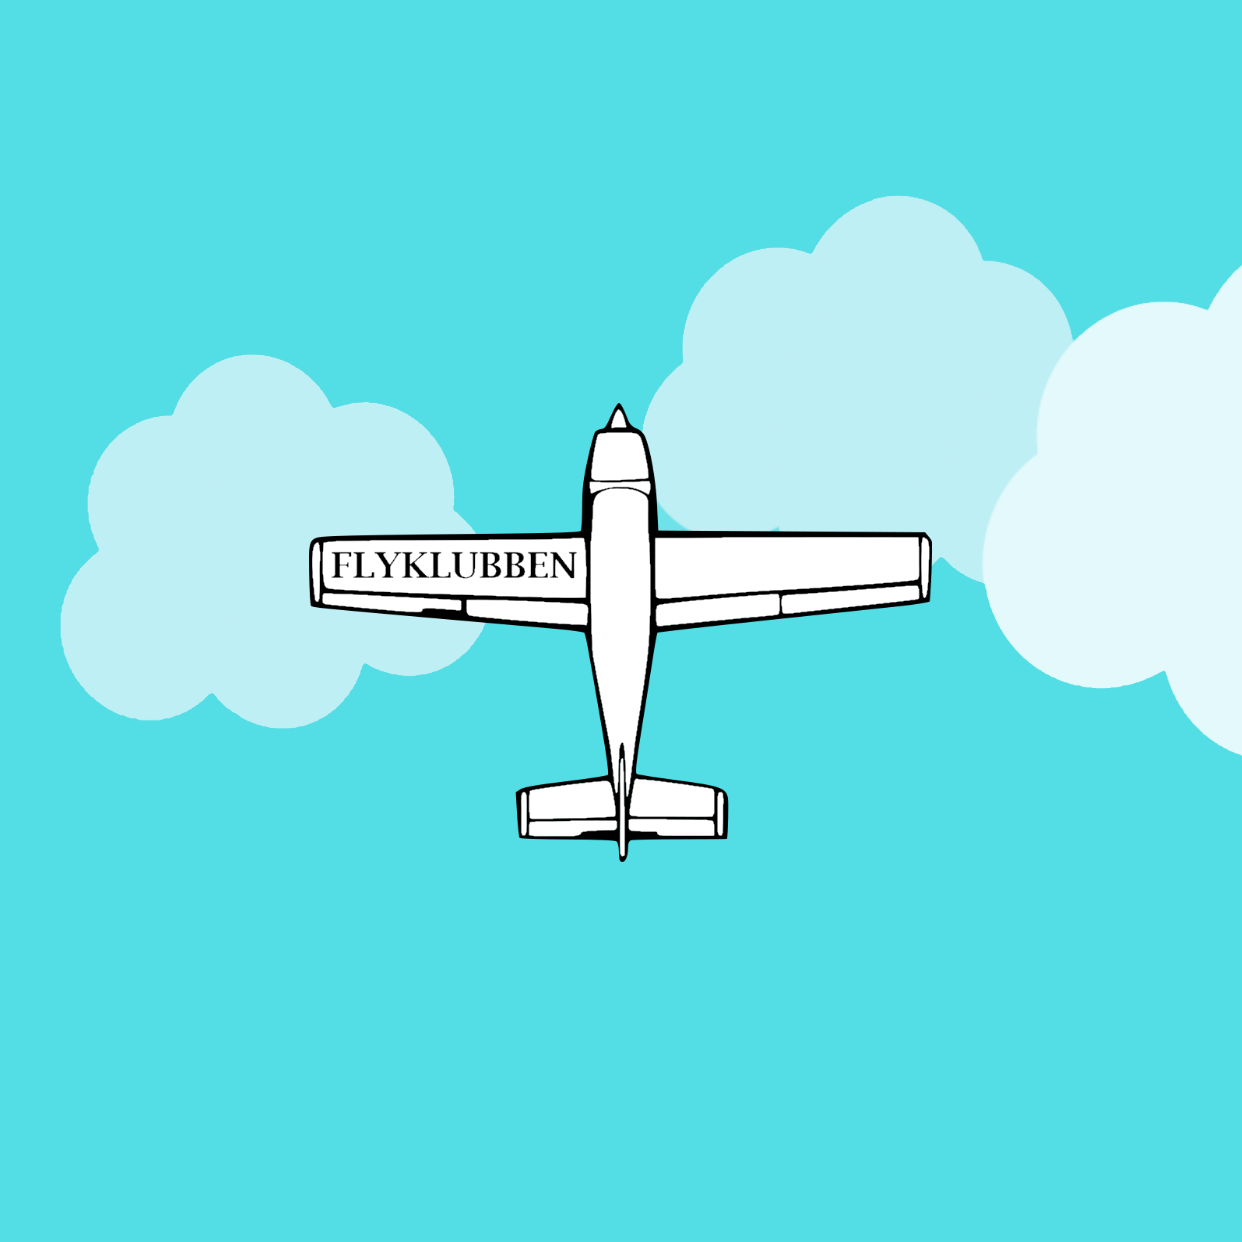 Ny app – Flyklubben